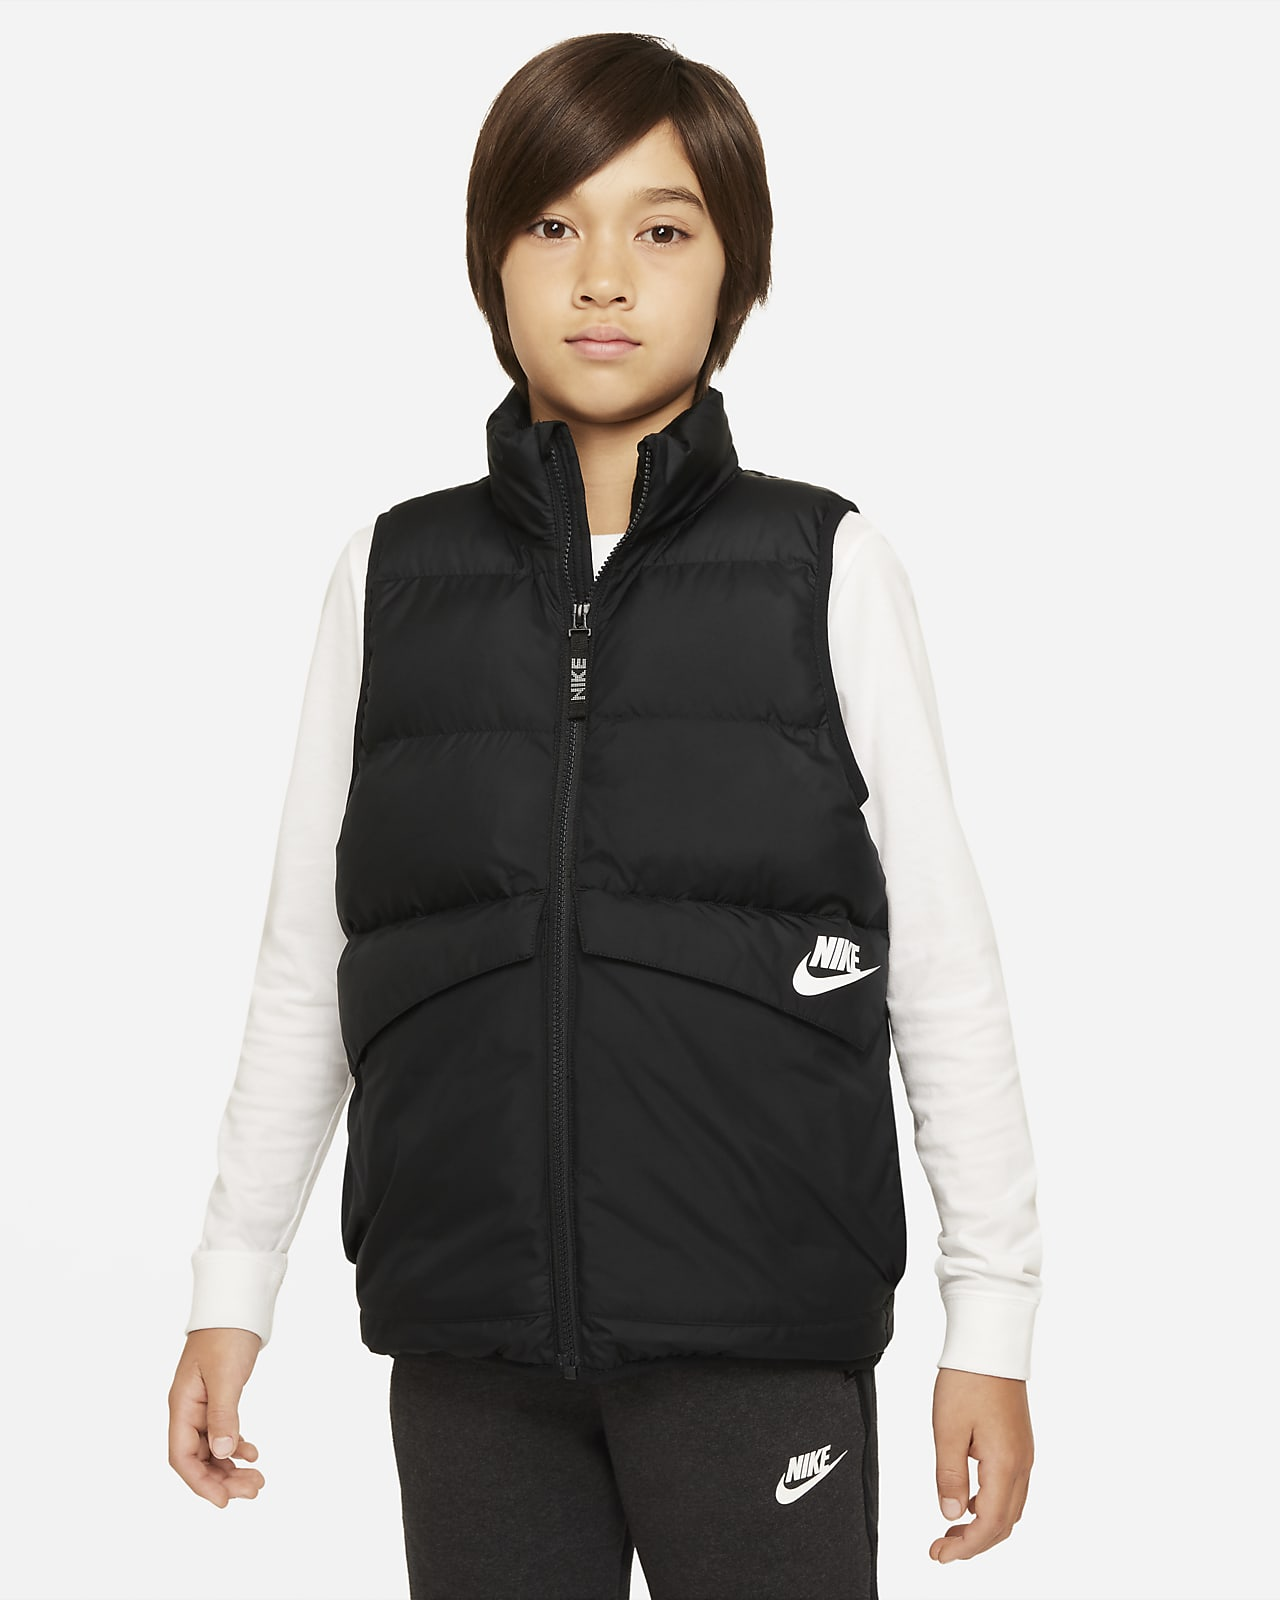 Colete com enchimento sintético Nike Sportswear Júnior